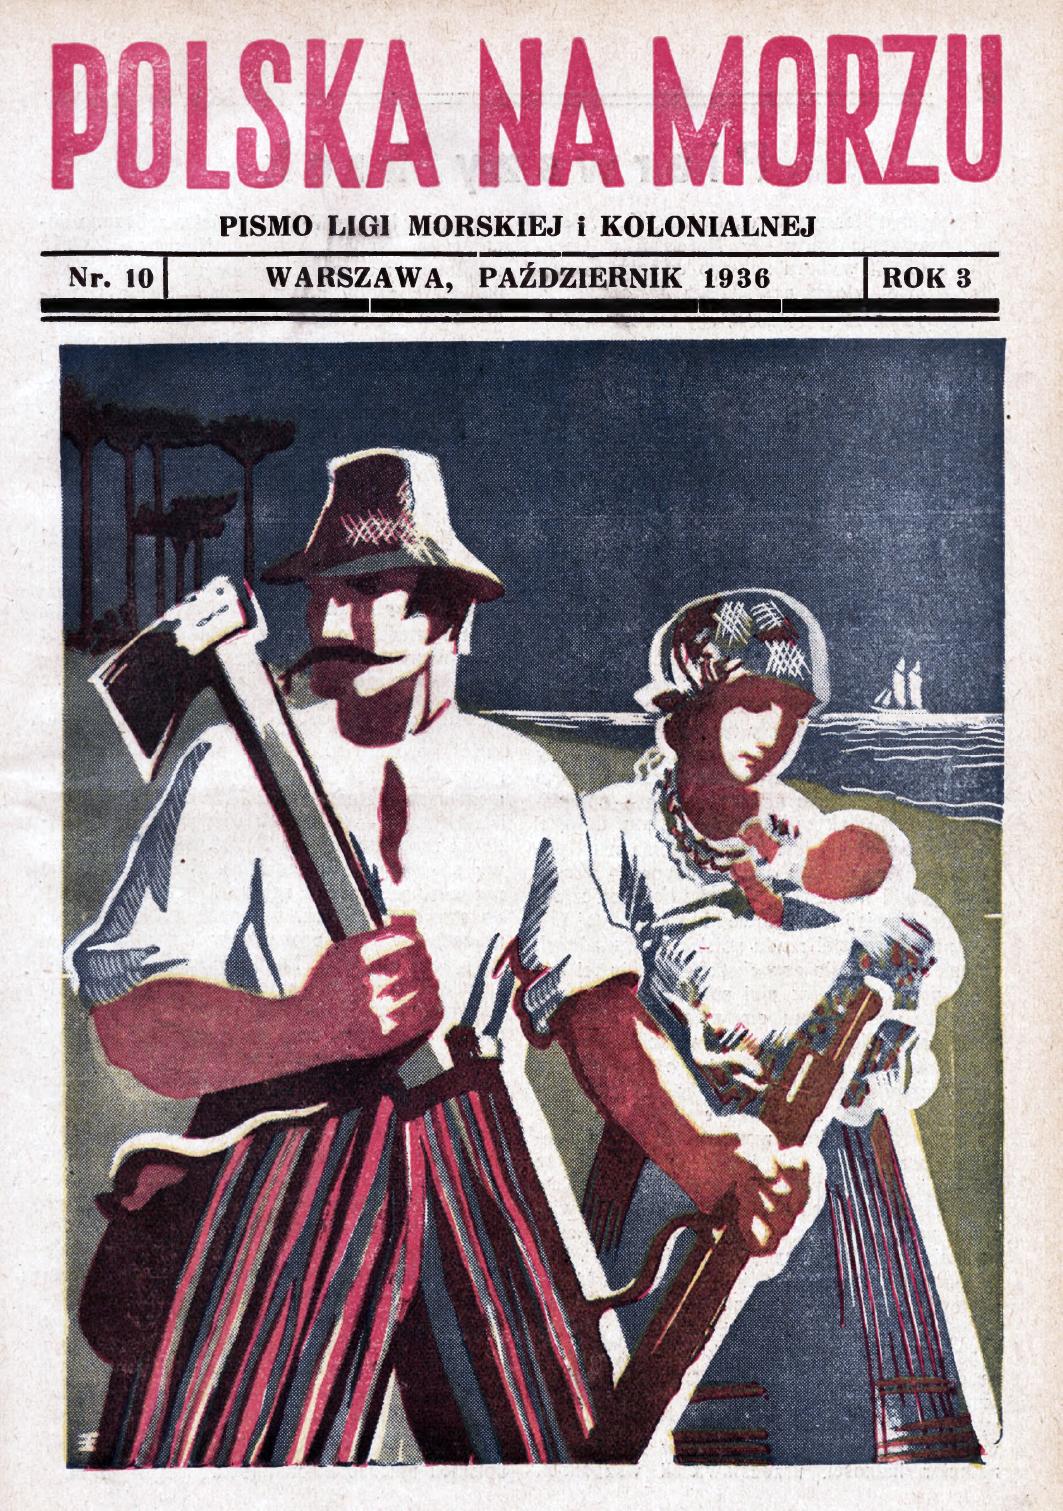 Polska na Morzu : pismo Ligi Morskiej i Kolonjalnej. - Liga Morska i Kolonjalna, 1936, nr 9